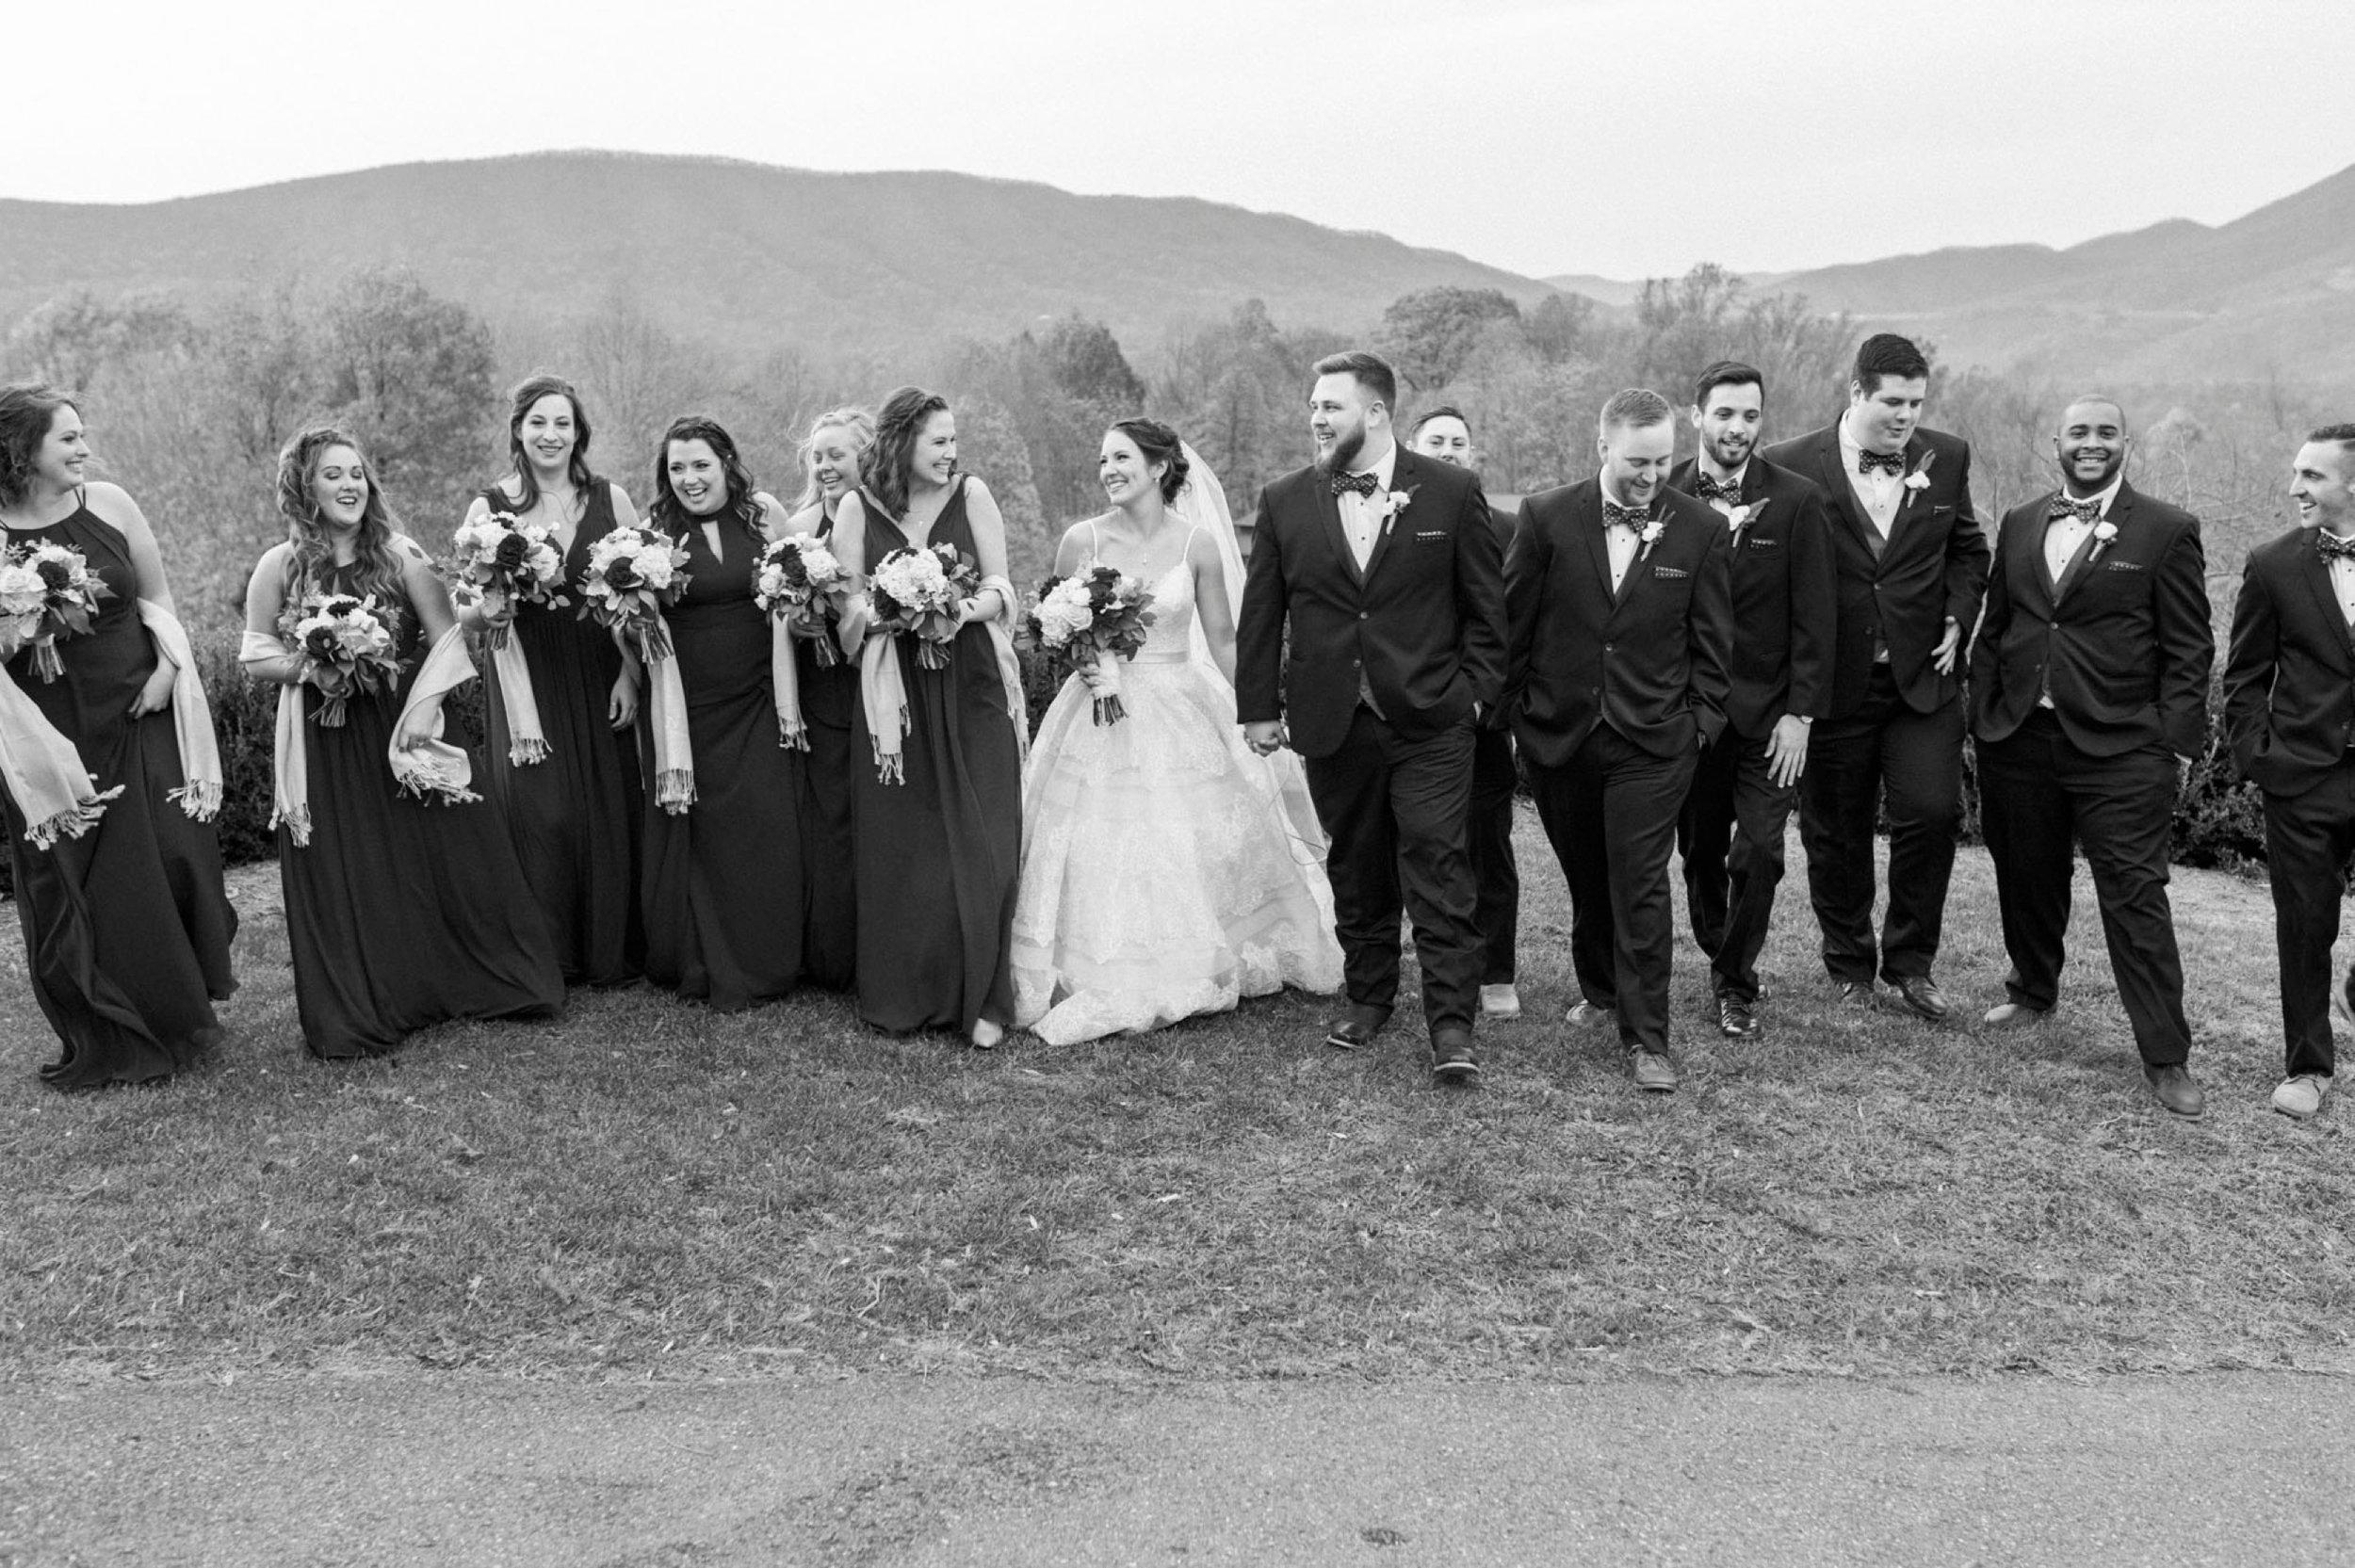 IrvineEstate_LexingtonVA_Wedding_FallWedding_VirginiaWeddingPhotographer 71.jpg